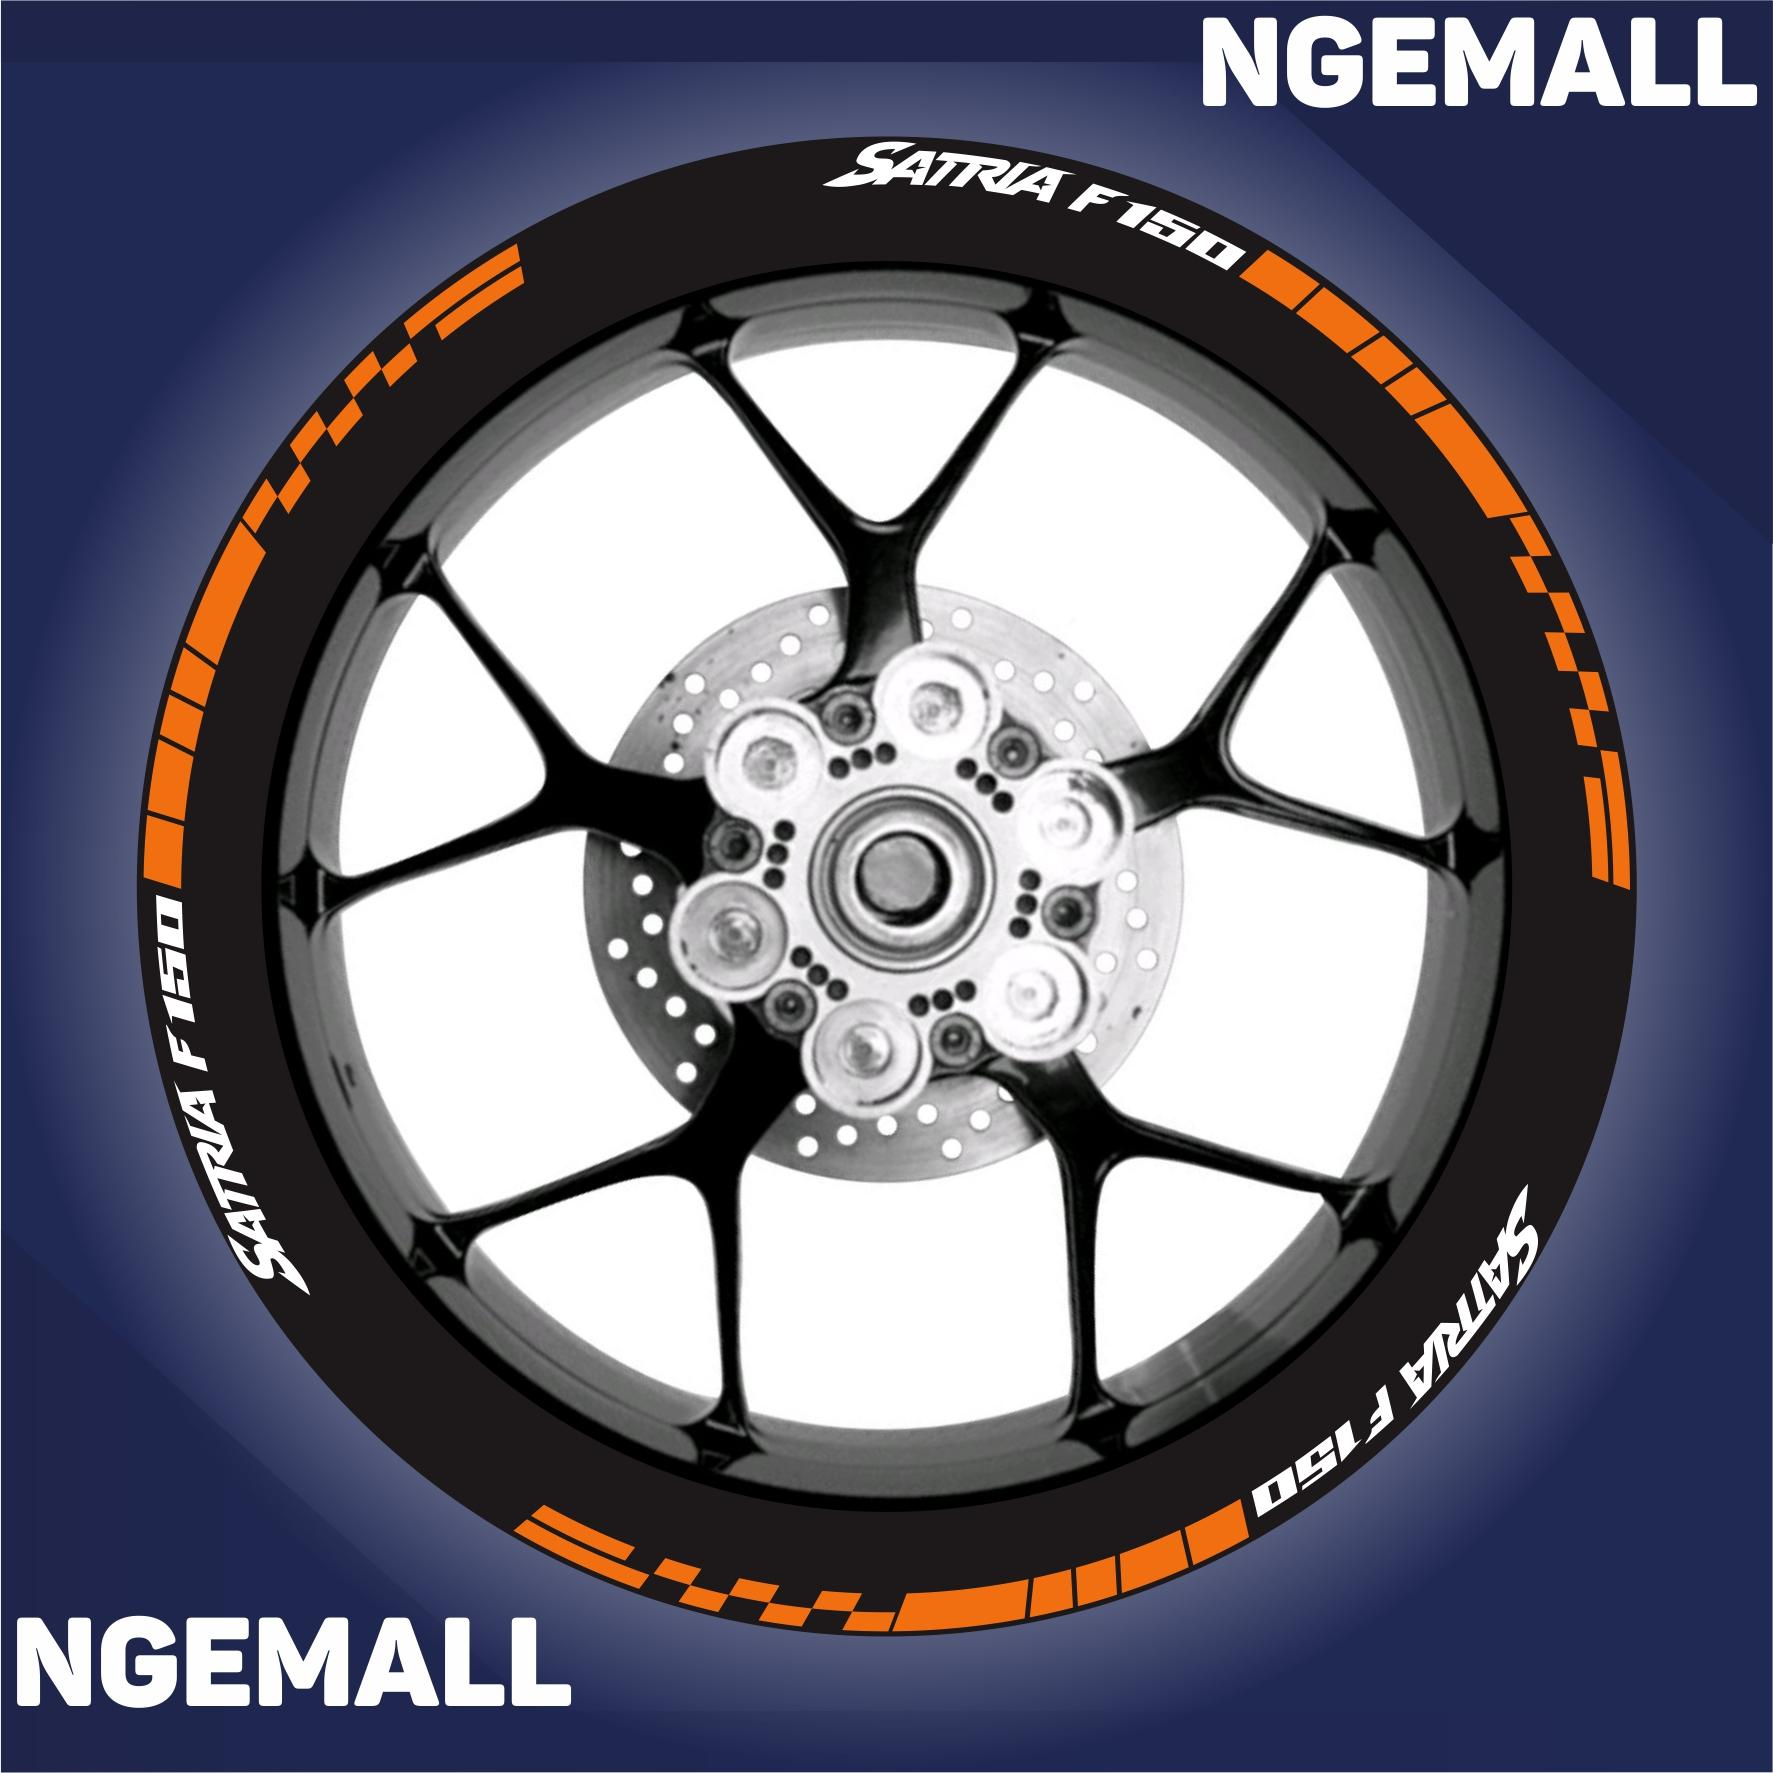 Ngemall - Aksesoris Motor Stiker Cutting 3 Velg Suzuki Satria - Orange Putih - Ngemall